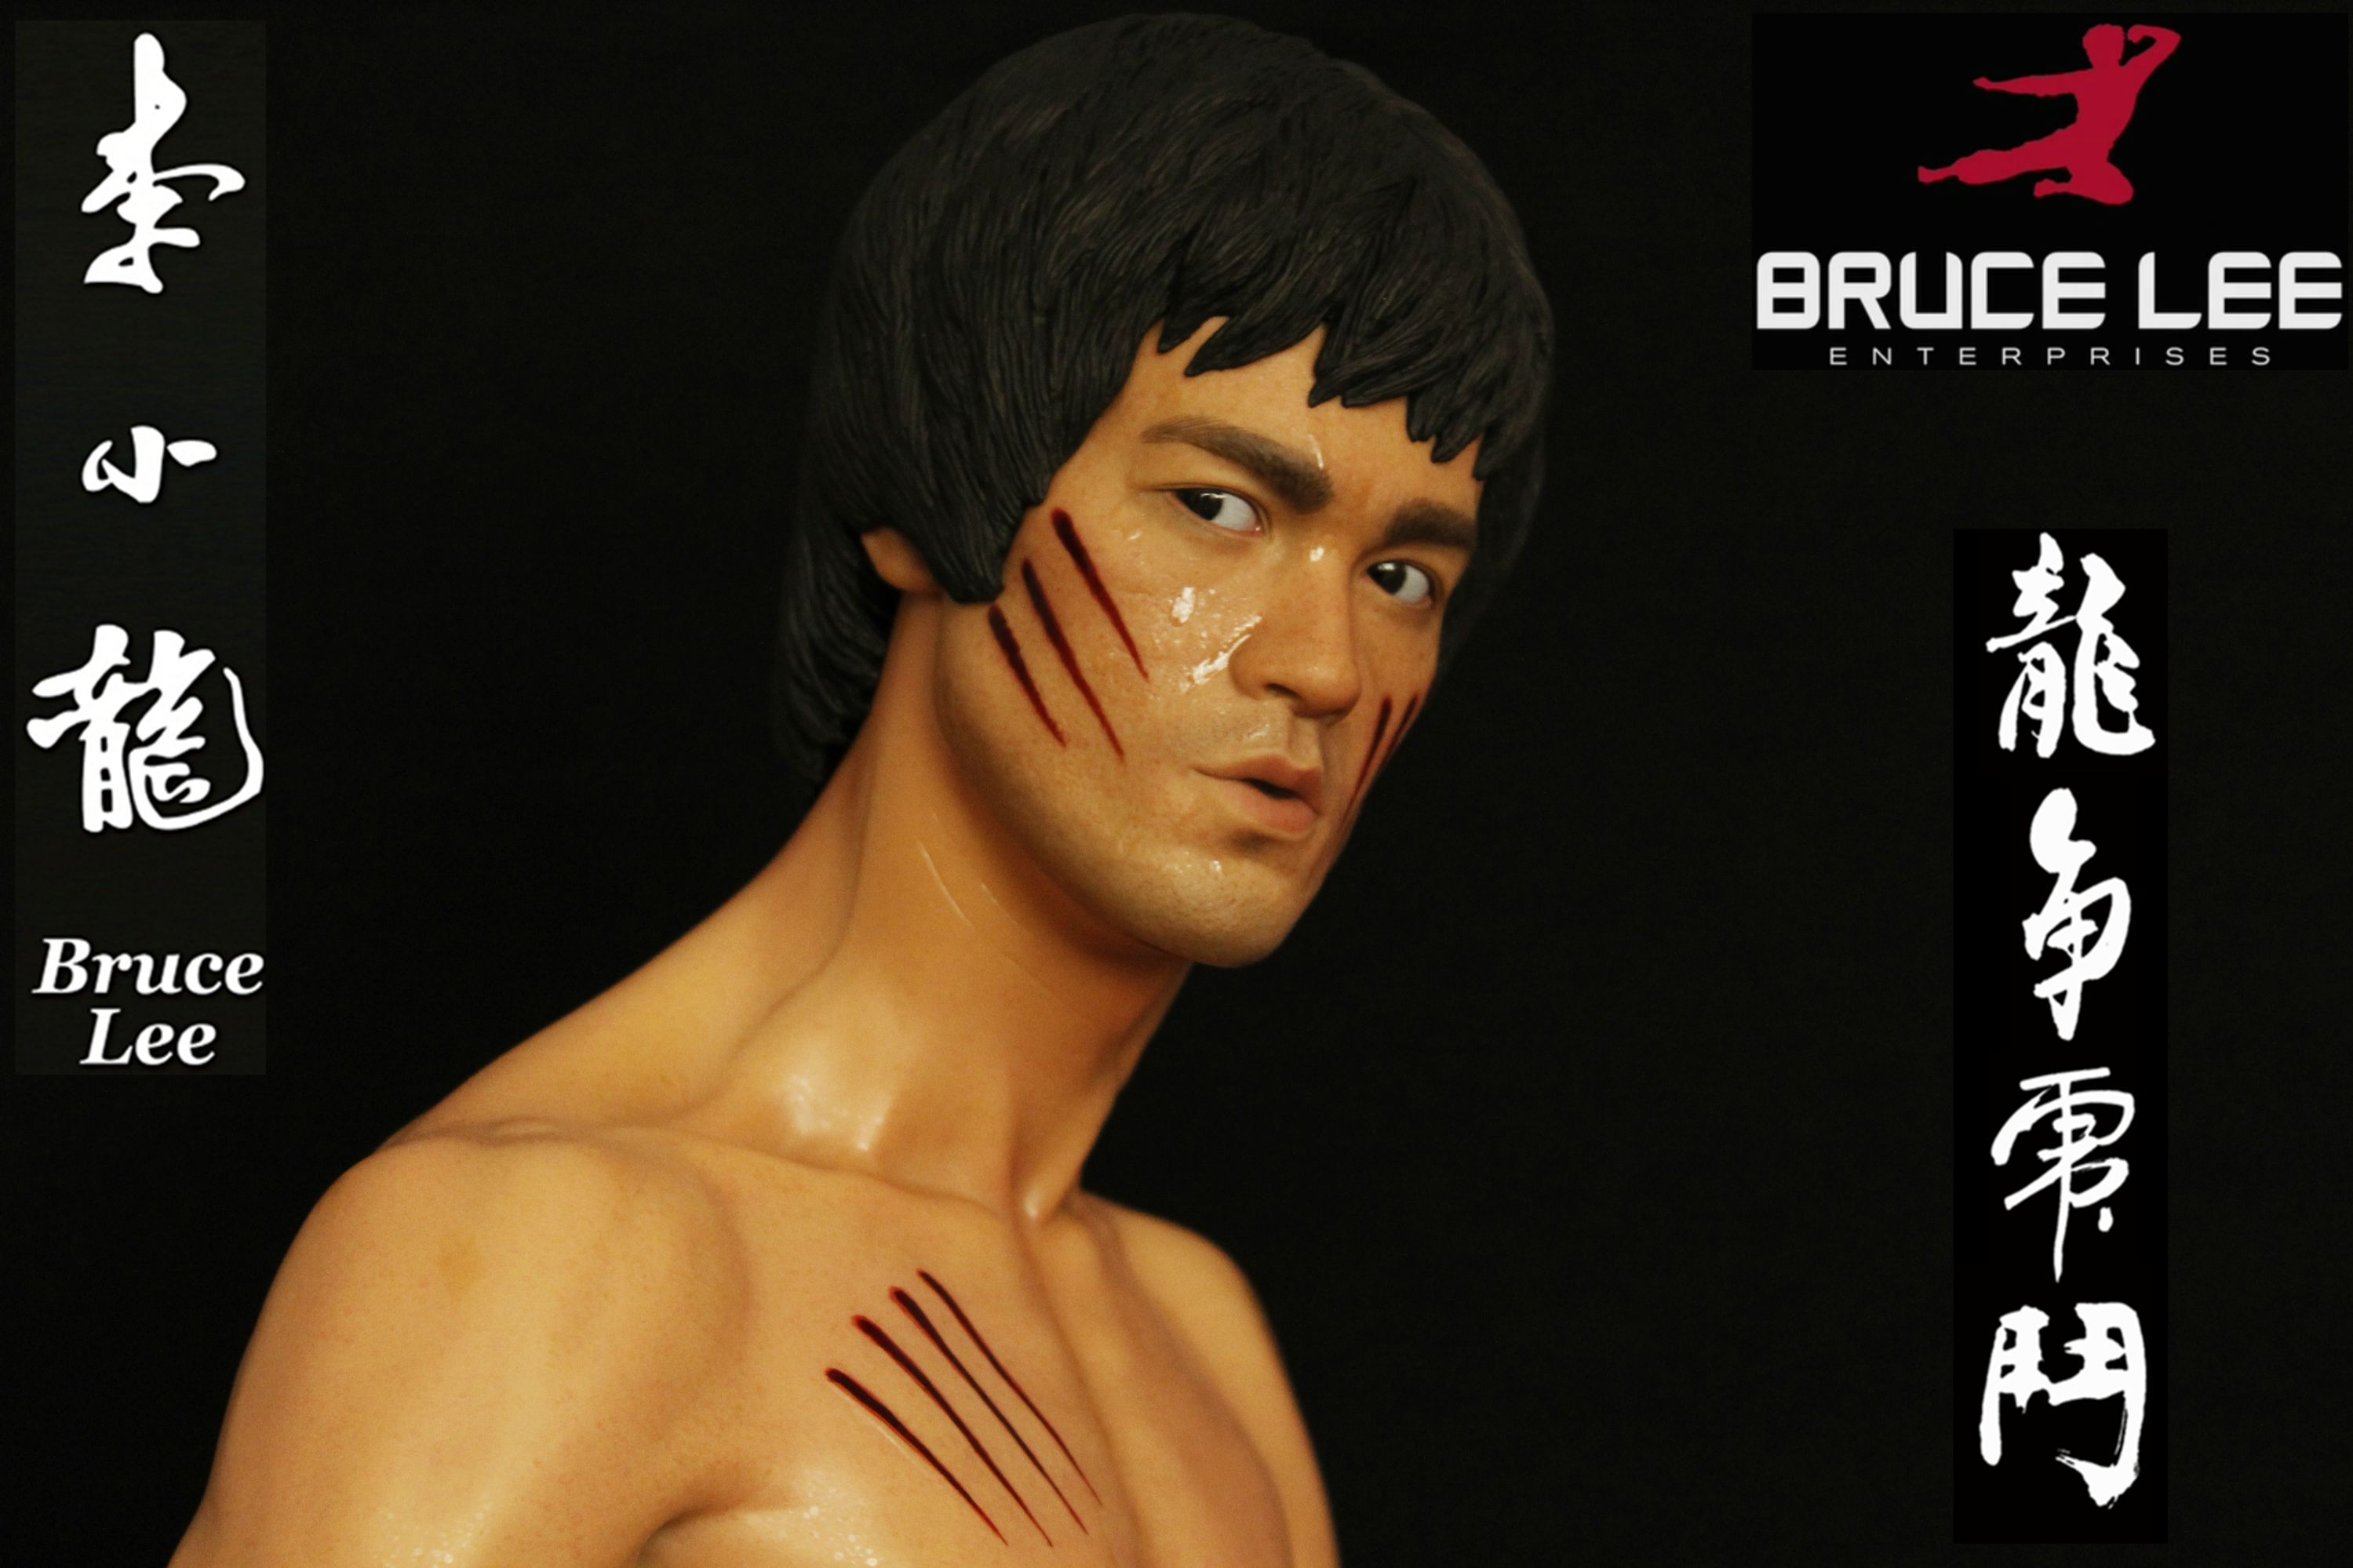 [Blitzway] Bruce Lee Tribute - 1/3 Scale - LANÇADO!!! - Página 6 211934a6skvaswvkgrggek